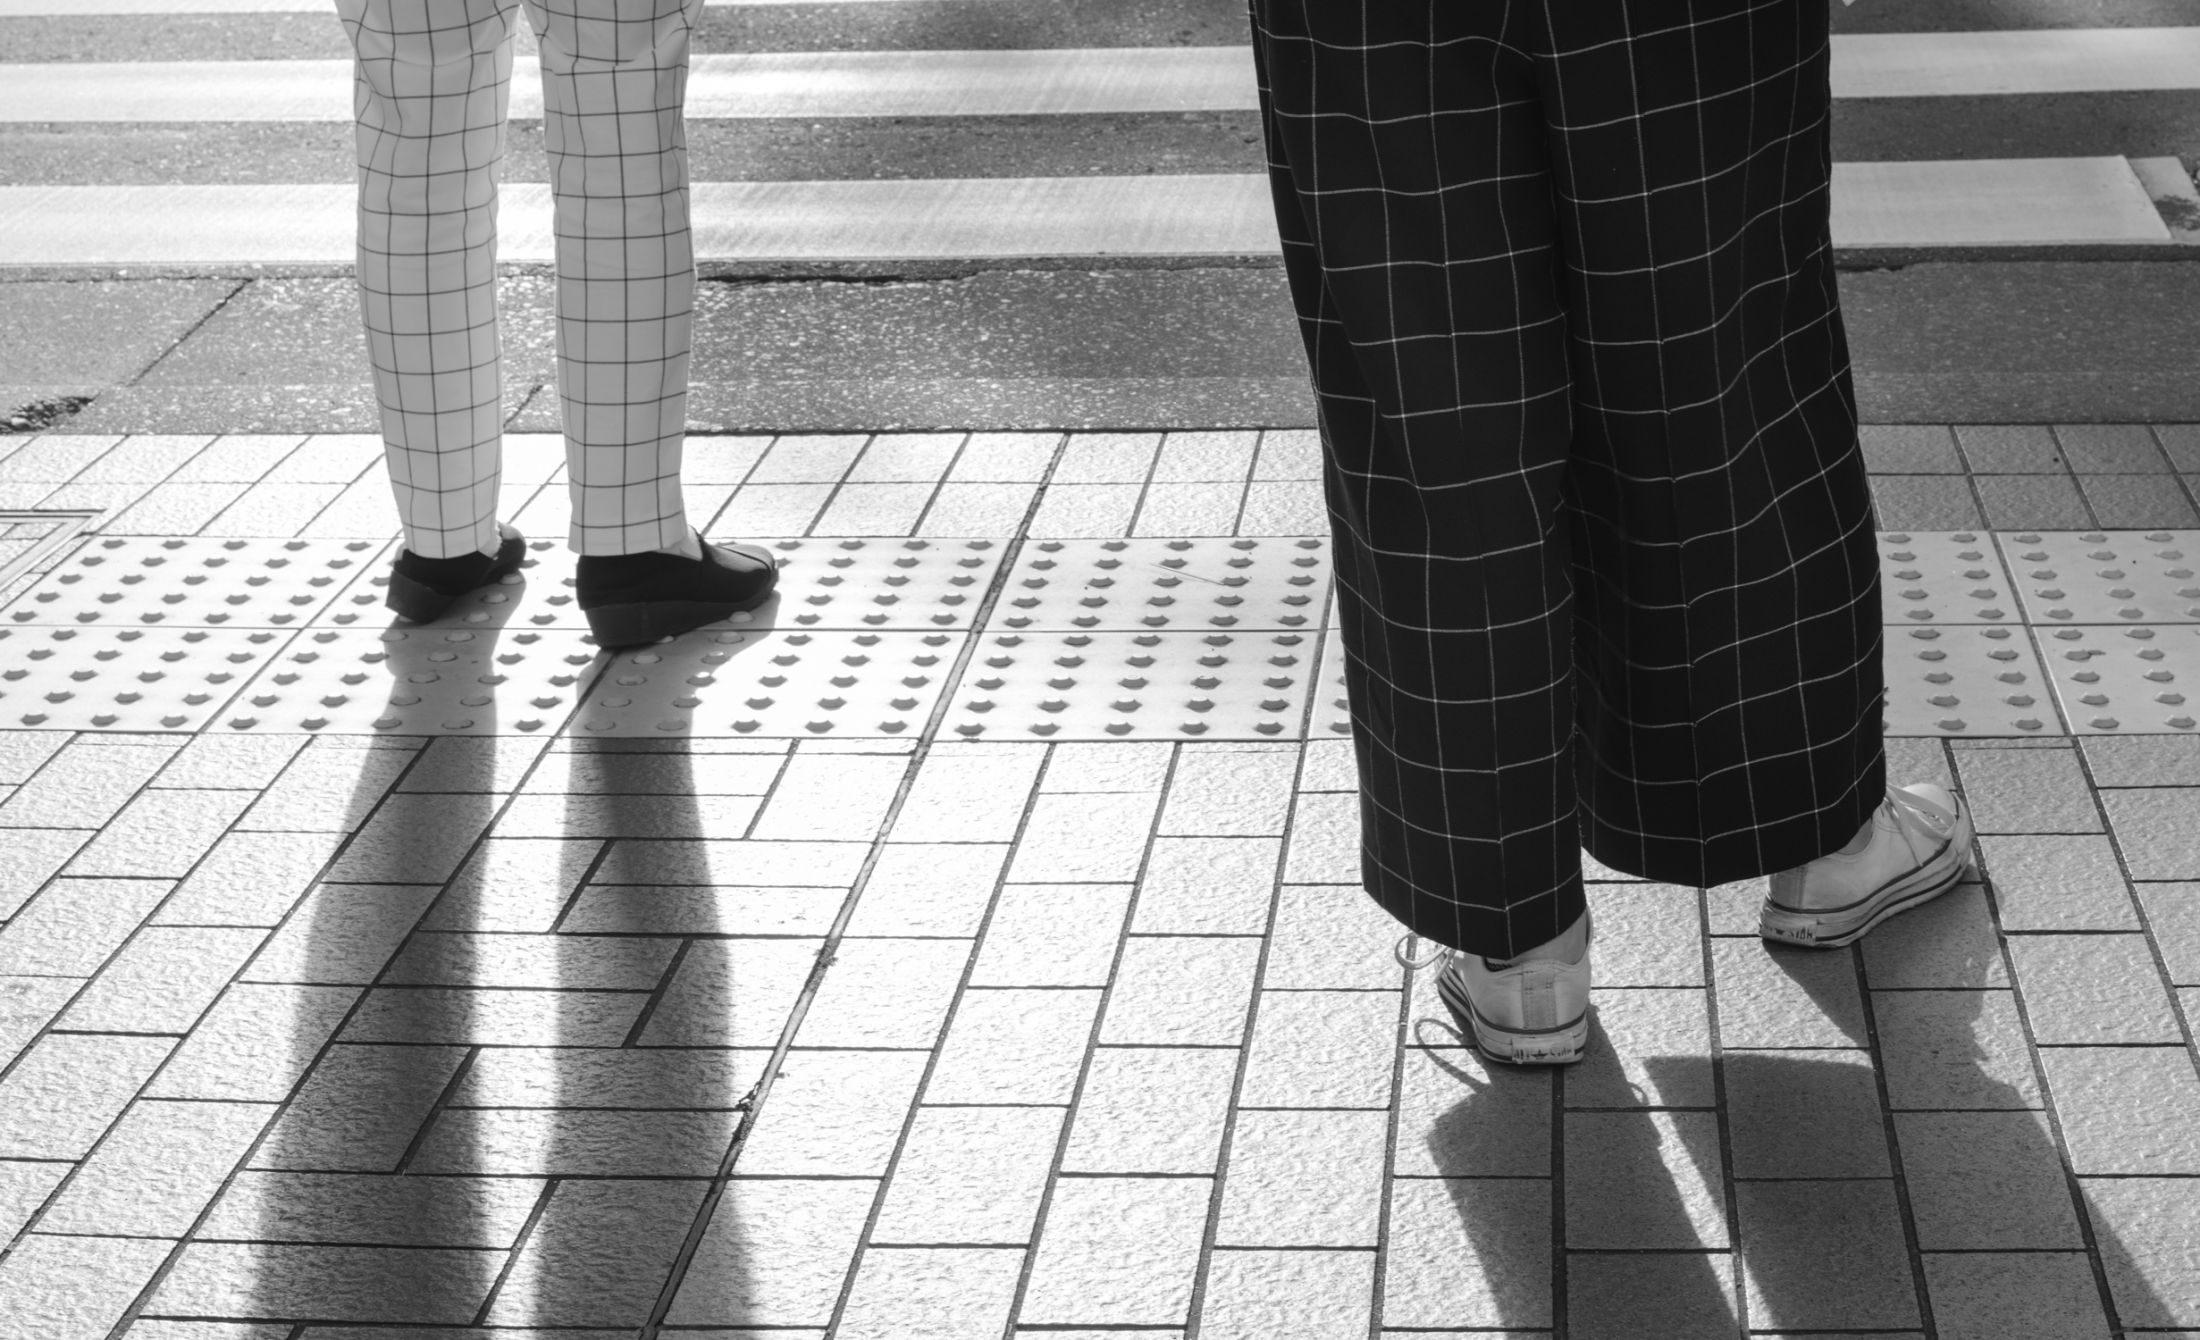 lonelinessintokyo (4)